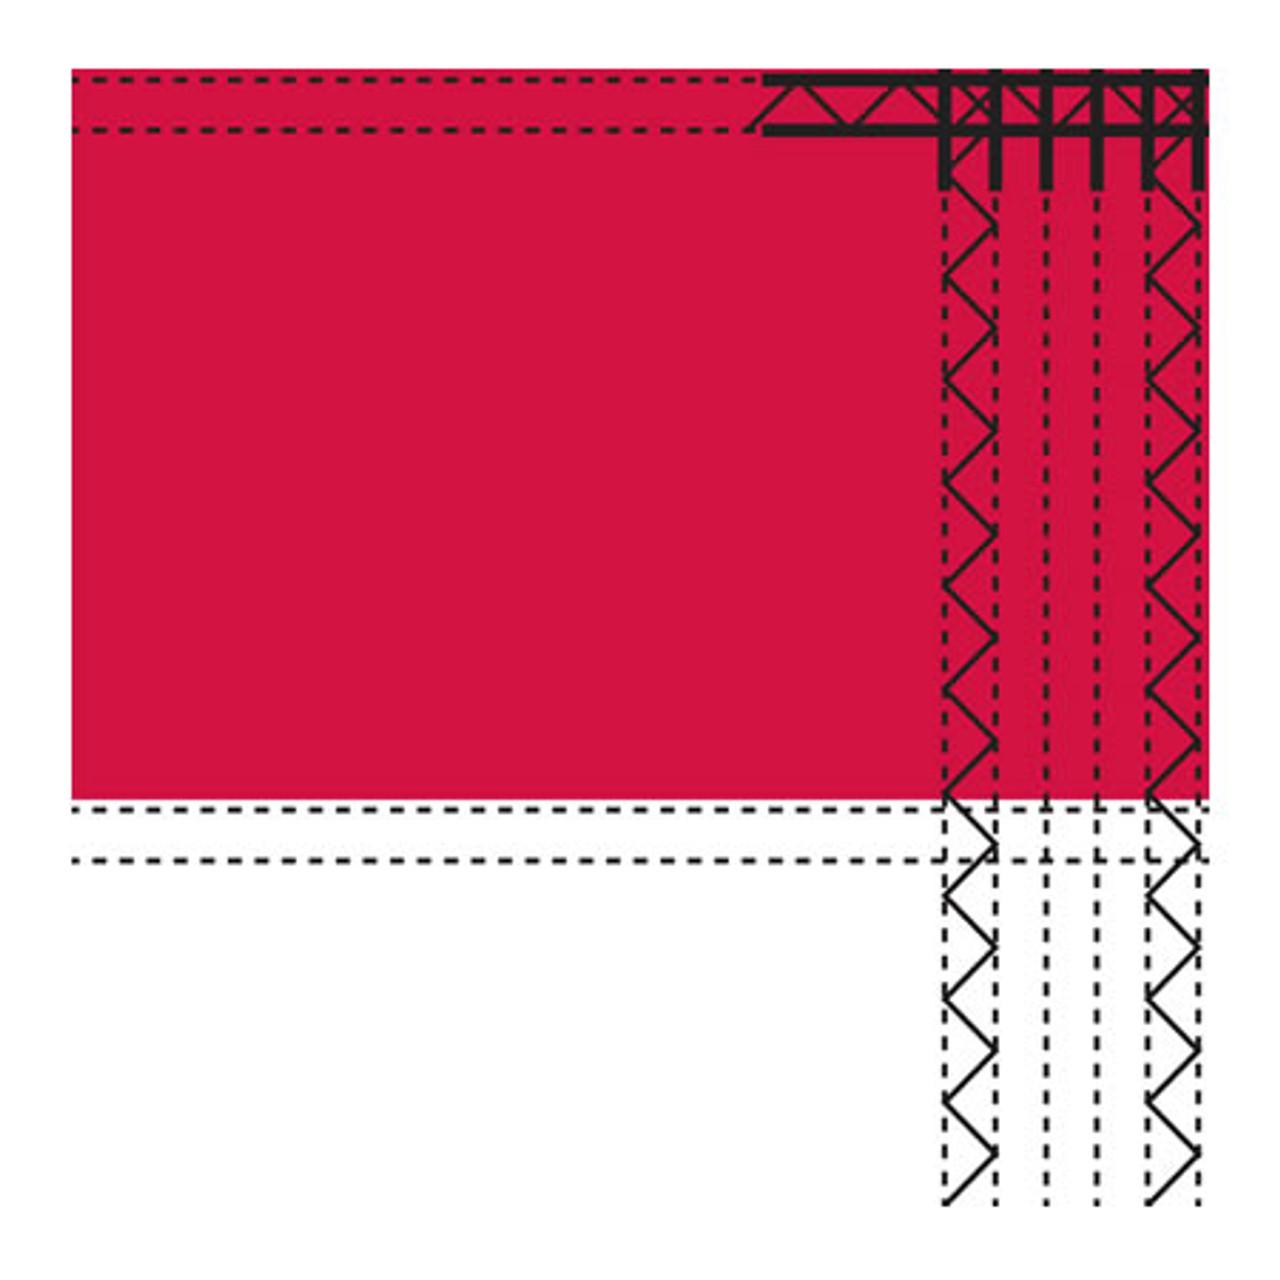 8' x 12' Polyester Texas Flag